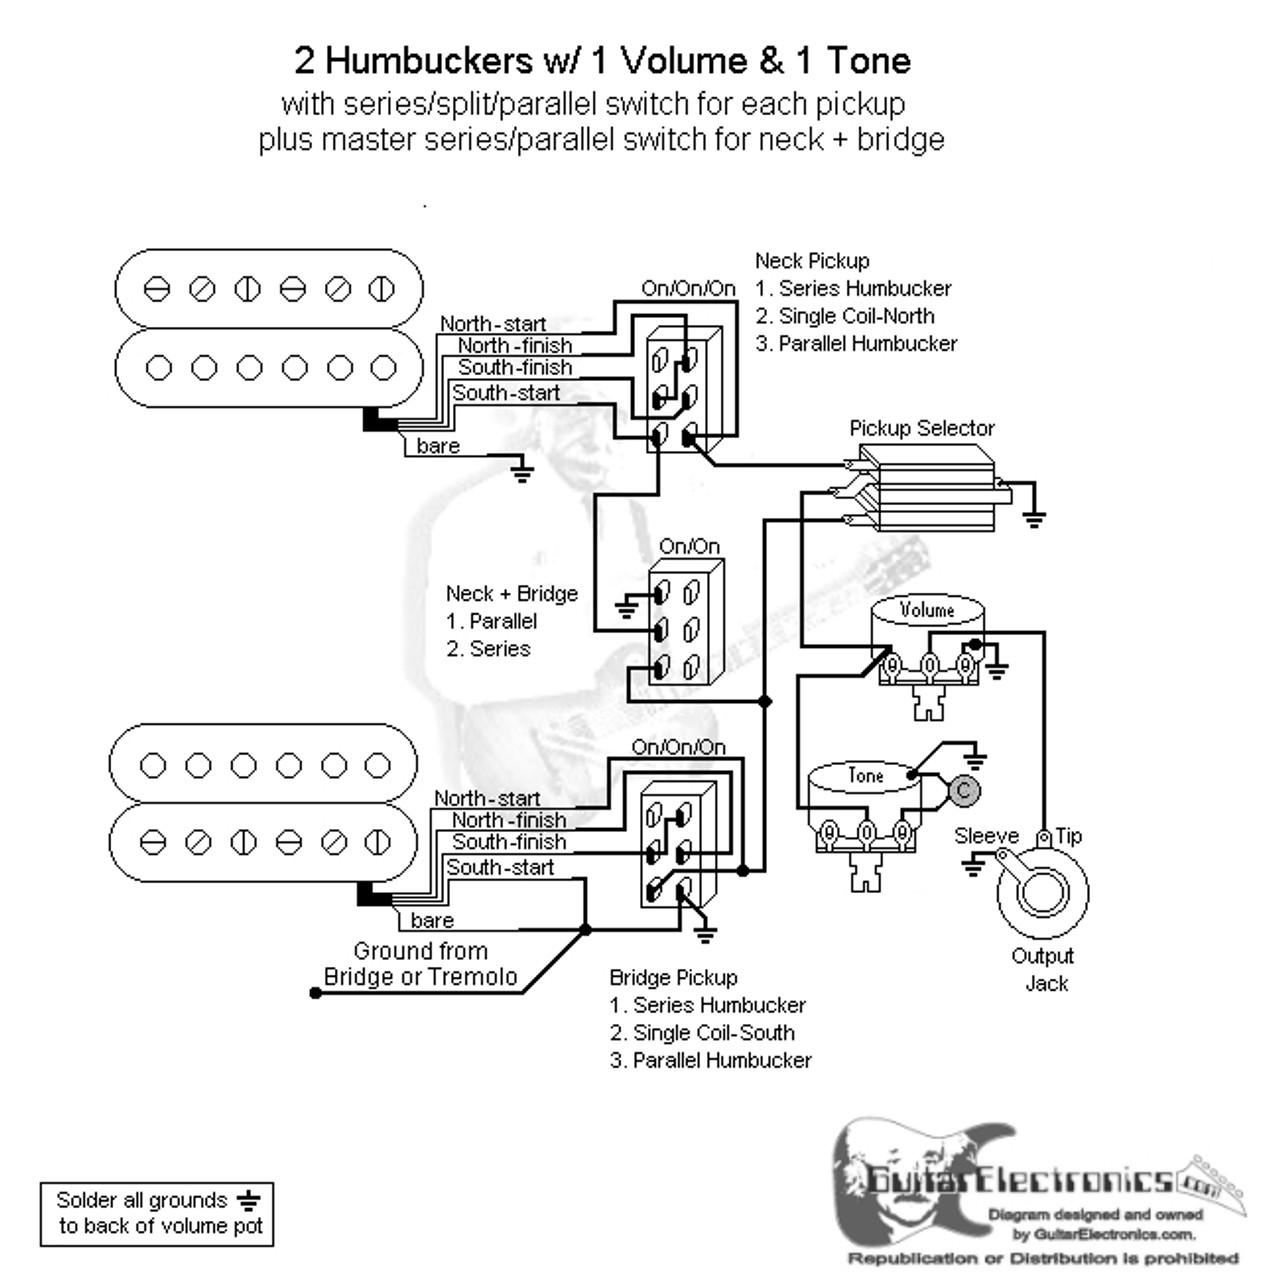 ethernet switch wiring diagram wiring diagrams konsultmini toggle switch wiring diagram wiring schematic diagram 57 ethernet [ 1280 x 1280 Pixel ]